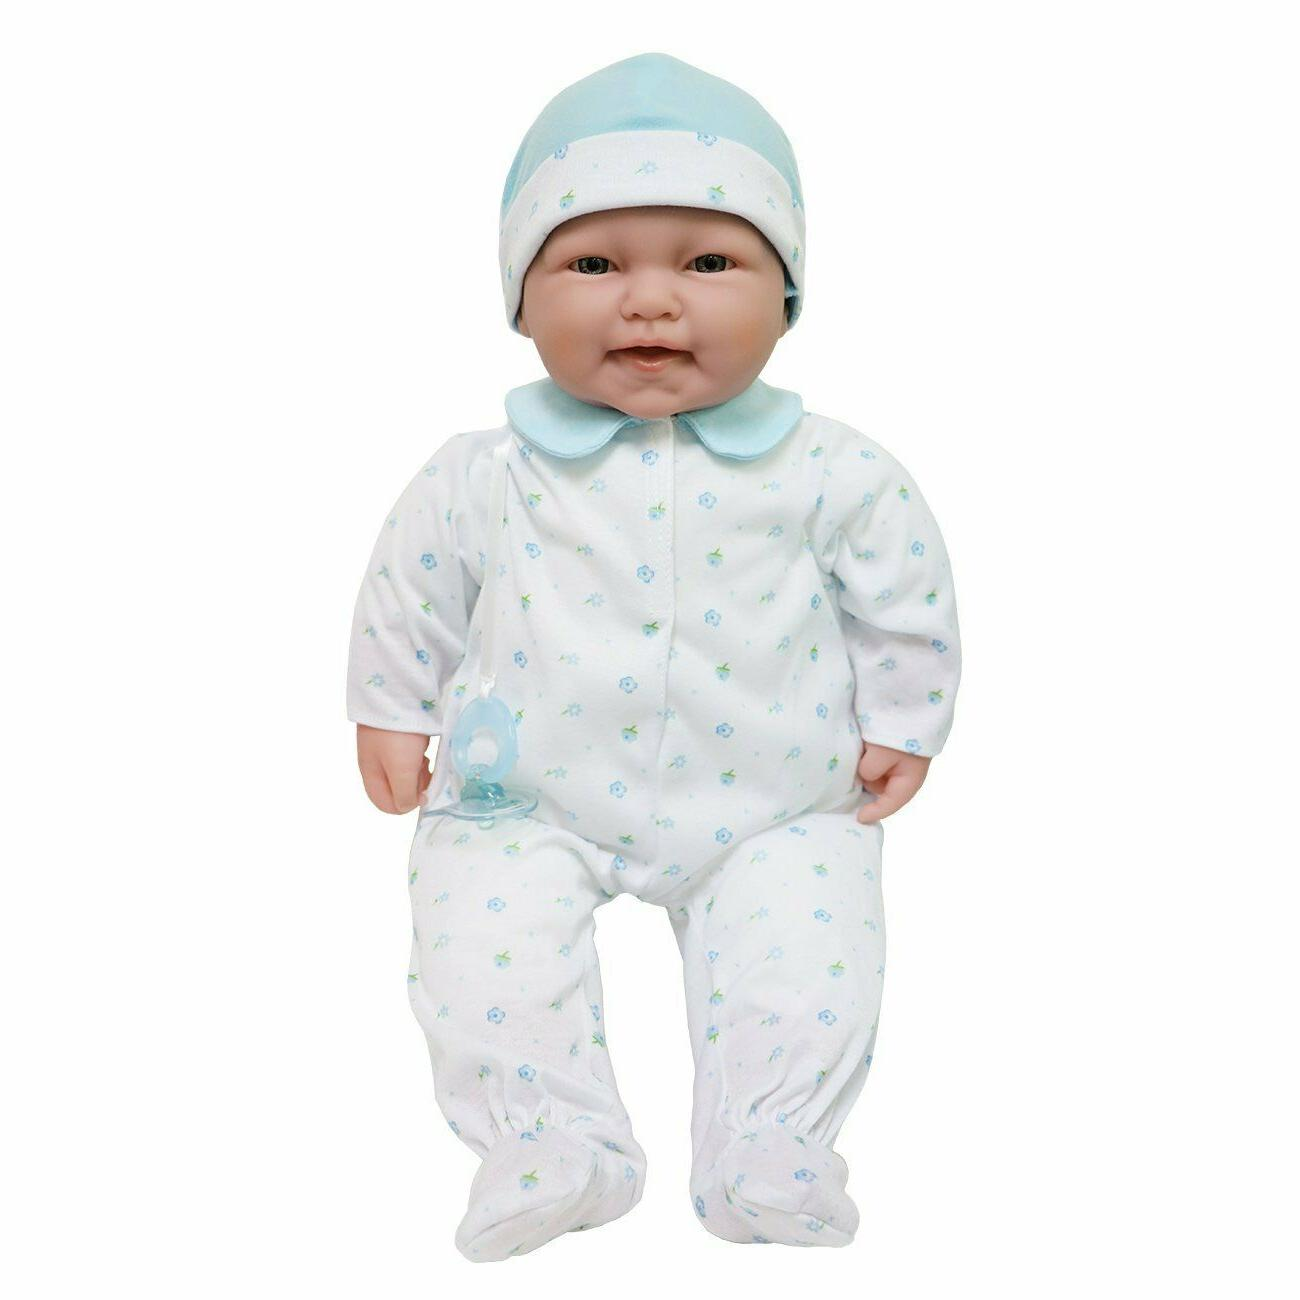 JC Toys, La Baby 20-inch Blue Washable Soft Body Boy Baby Do